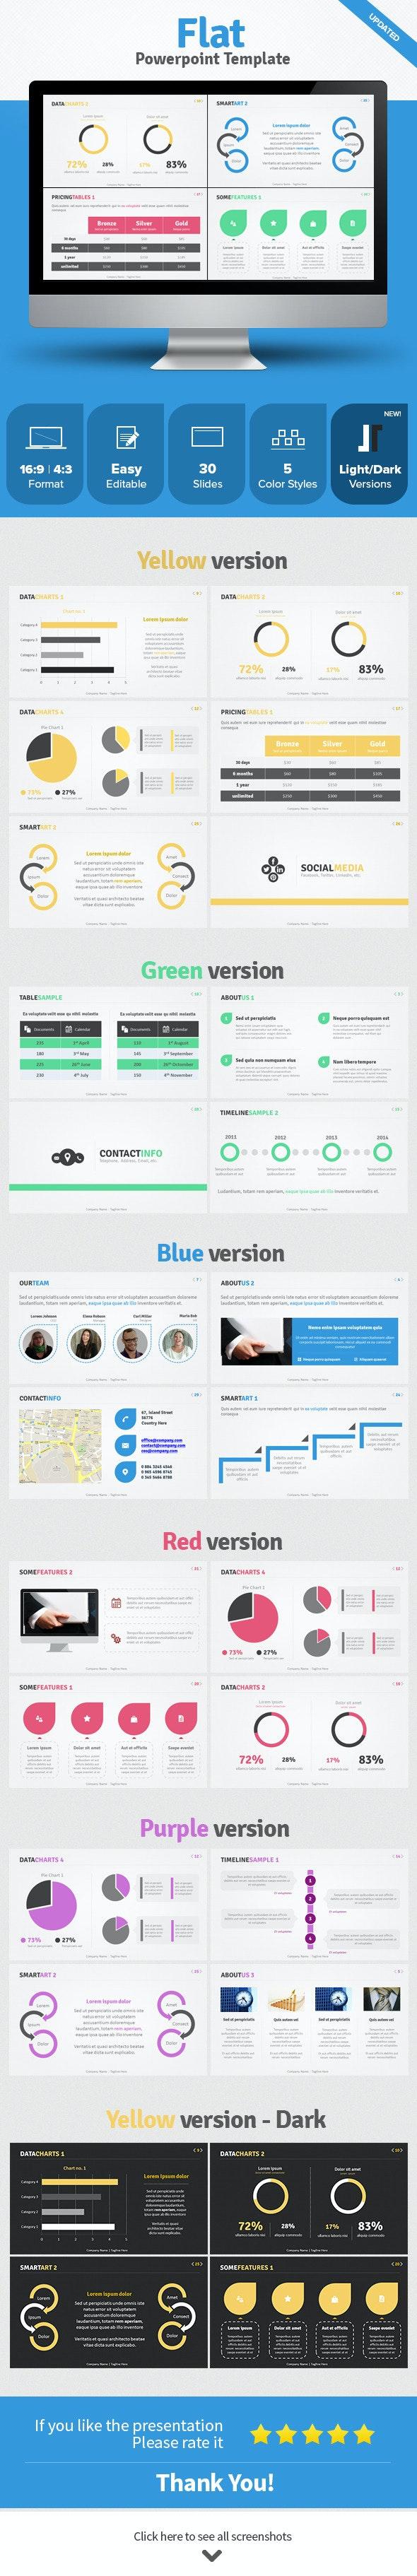 Flat Powerpoint Template - Business PowerPoint Templates